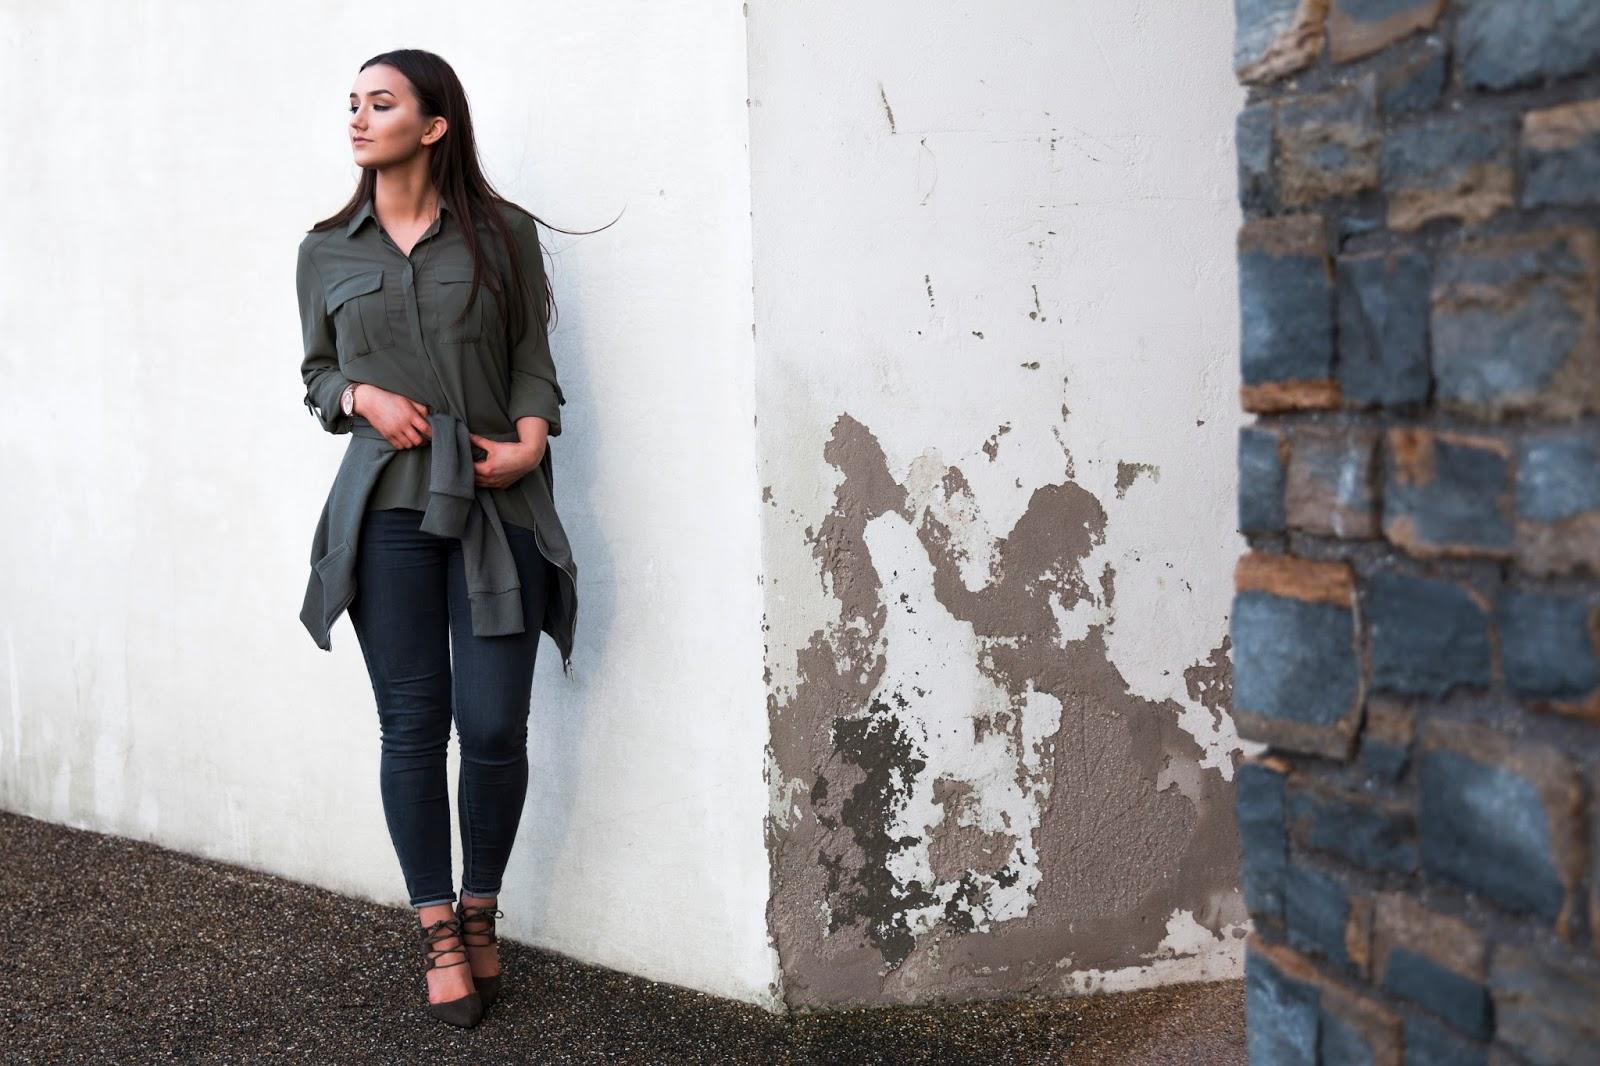 Killer Khaki, An Outfit Post Styled by Kayley Anne Jones, featuring Khaki Shirt, Khaki Heels, Khaki Zip Hoodie and Denim Jeans.